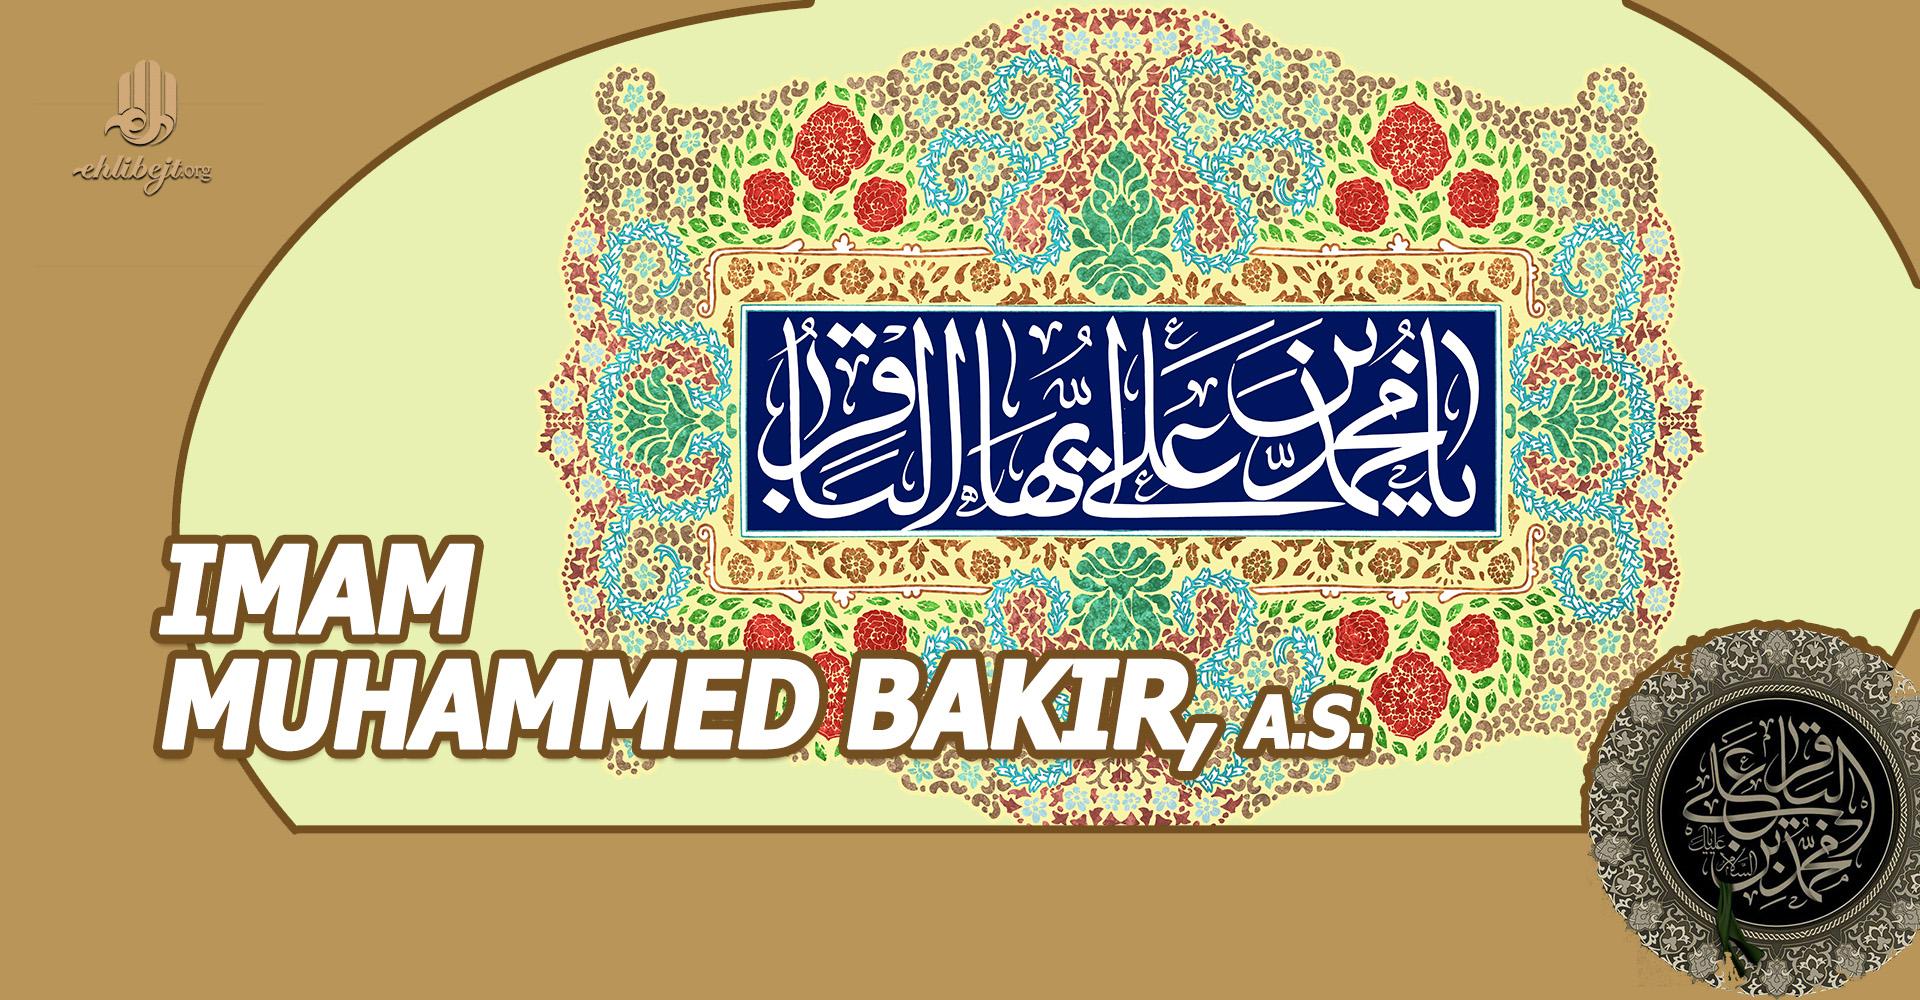 Imam Muhammed Bakir, a.s.